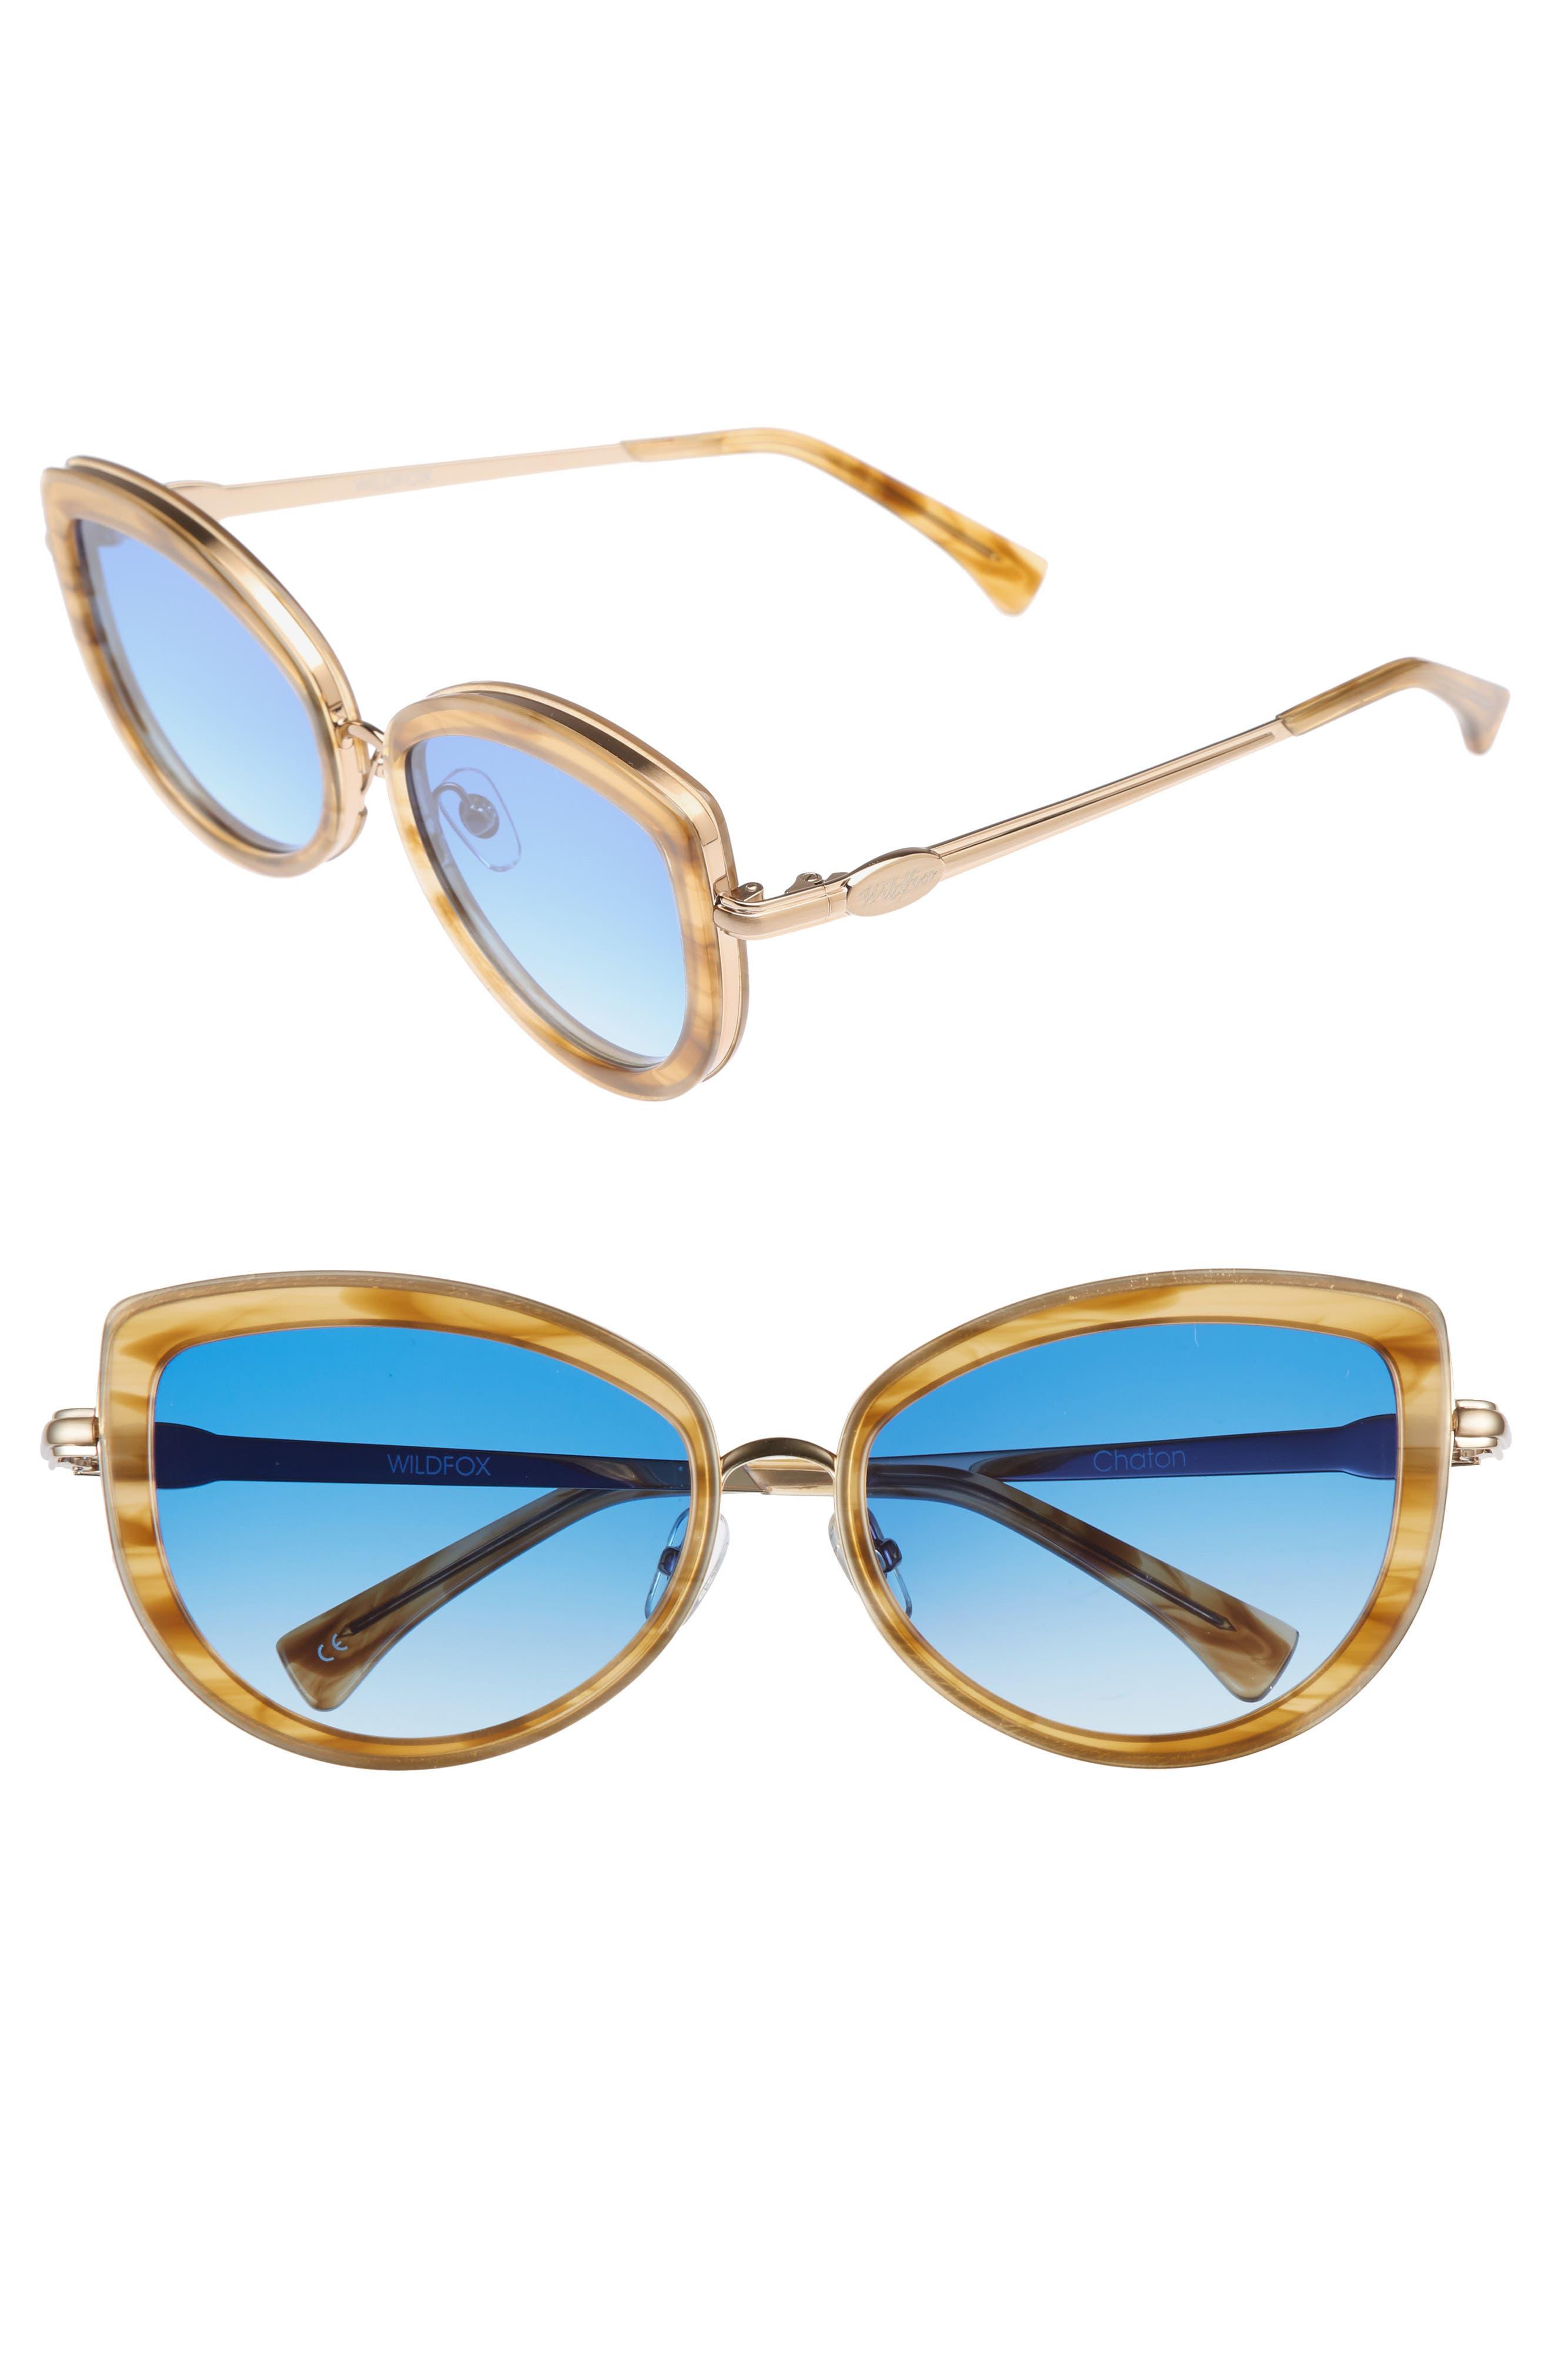 Wildfox Chaton 54mm Sunglasses